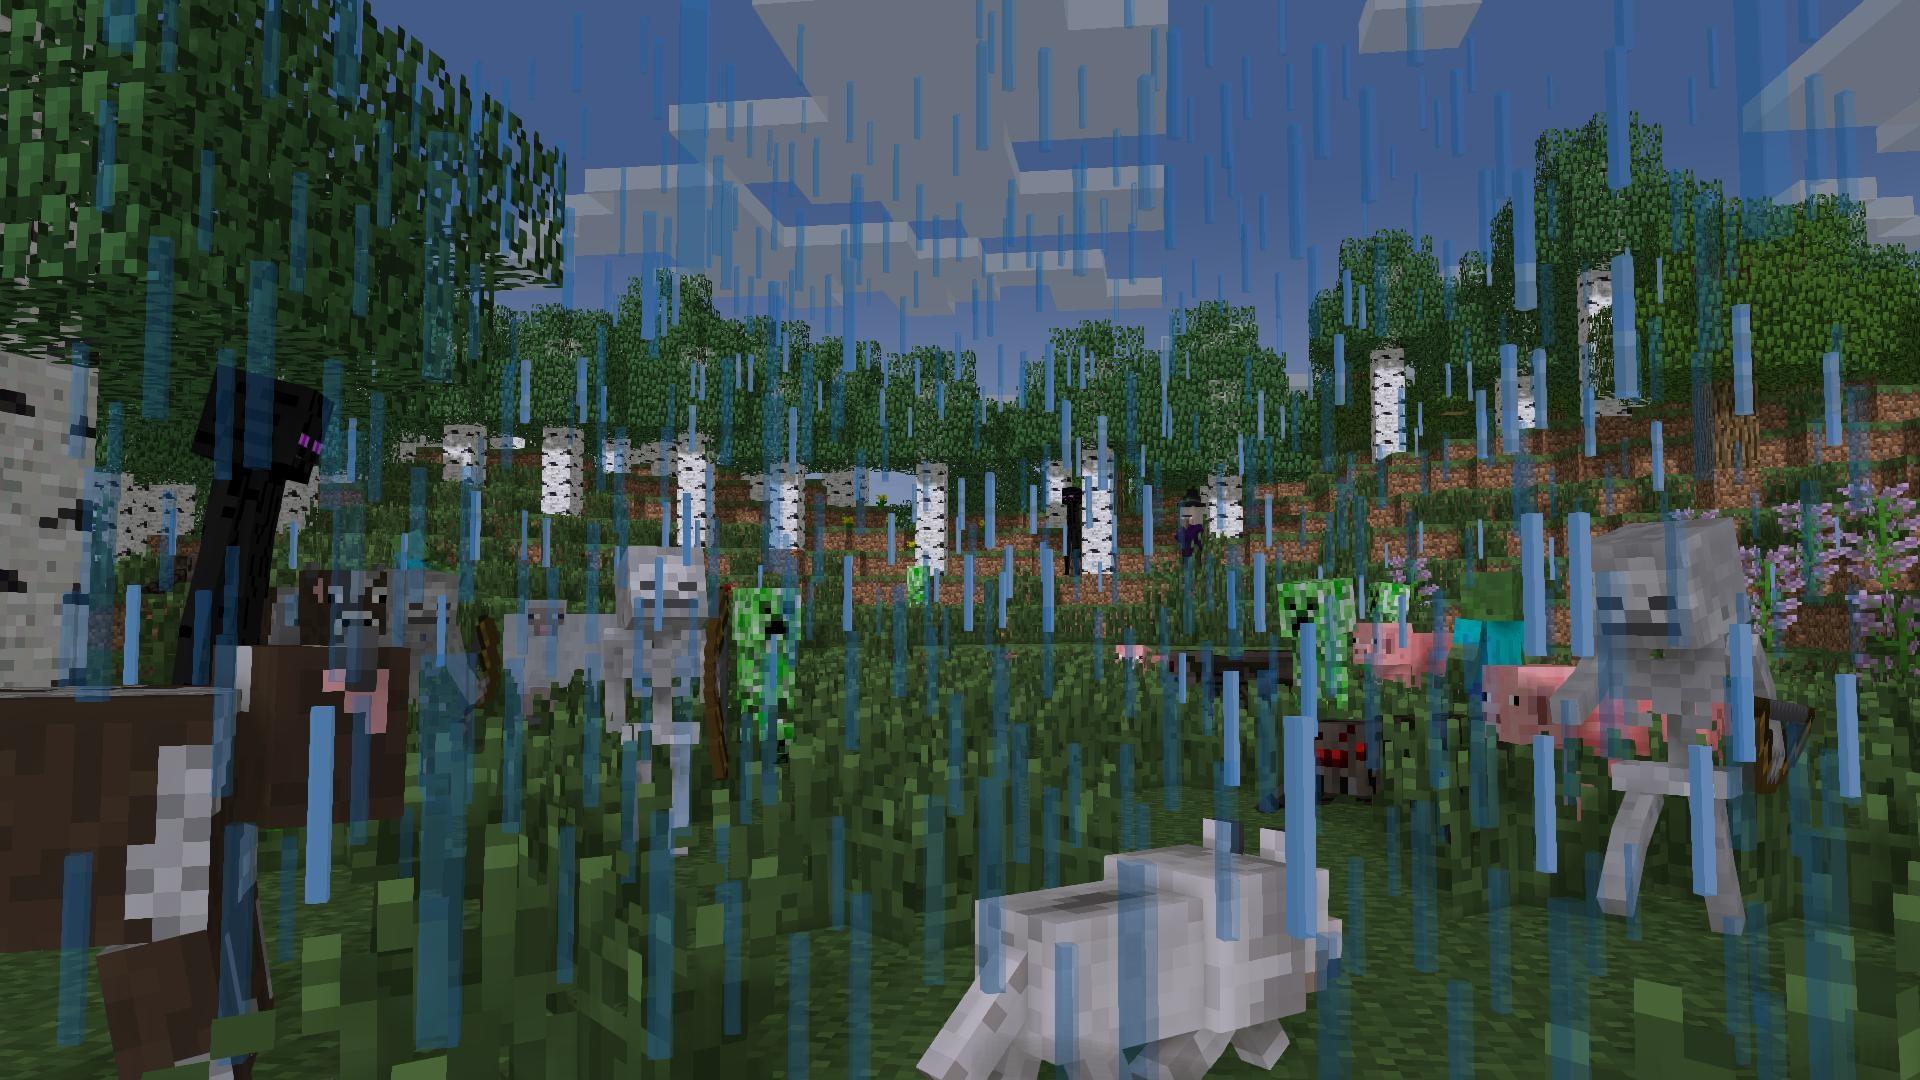 Raining alot in minecraft, not so much on mine-imator.